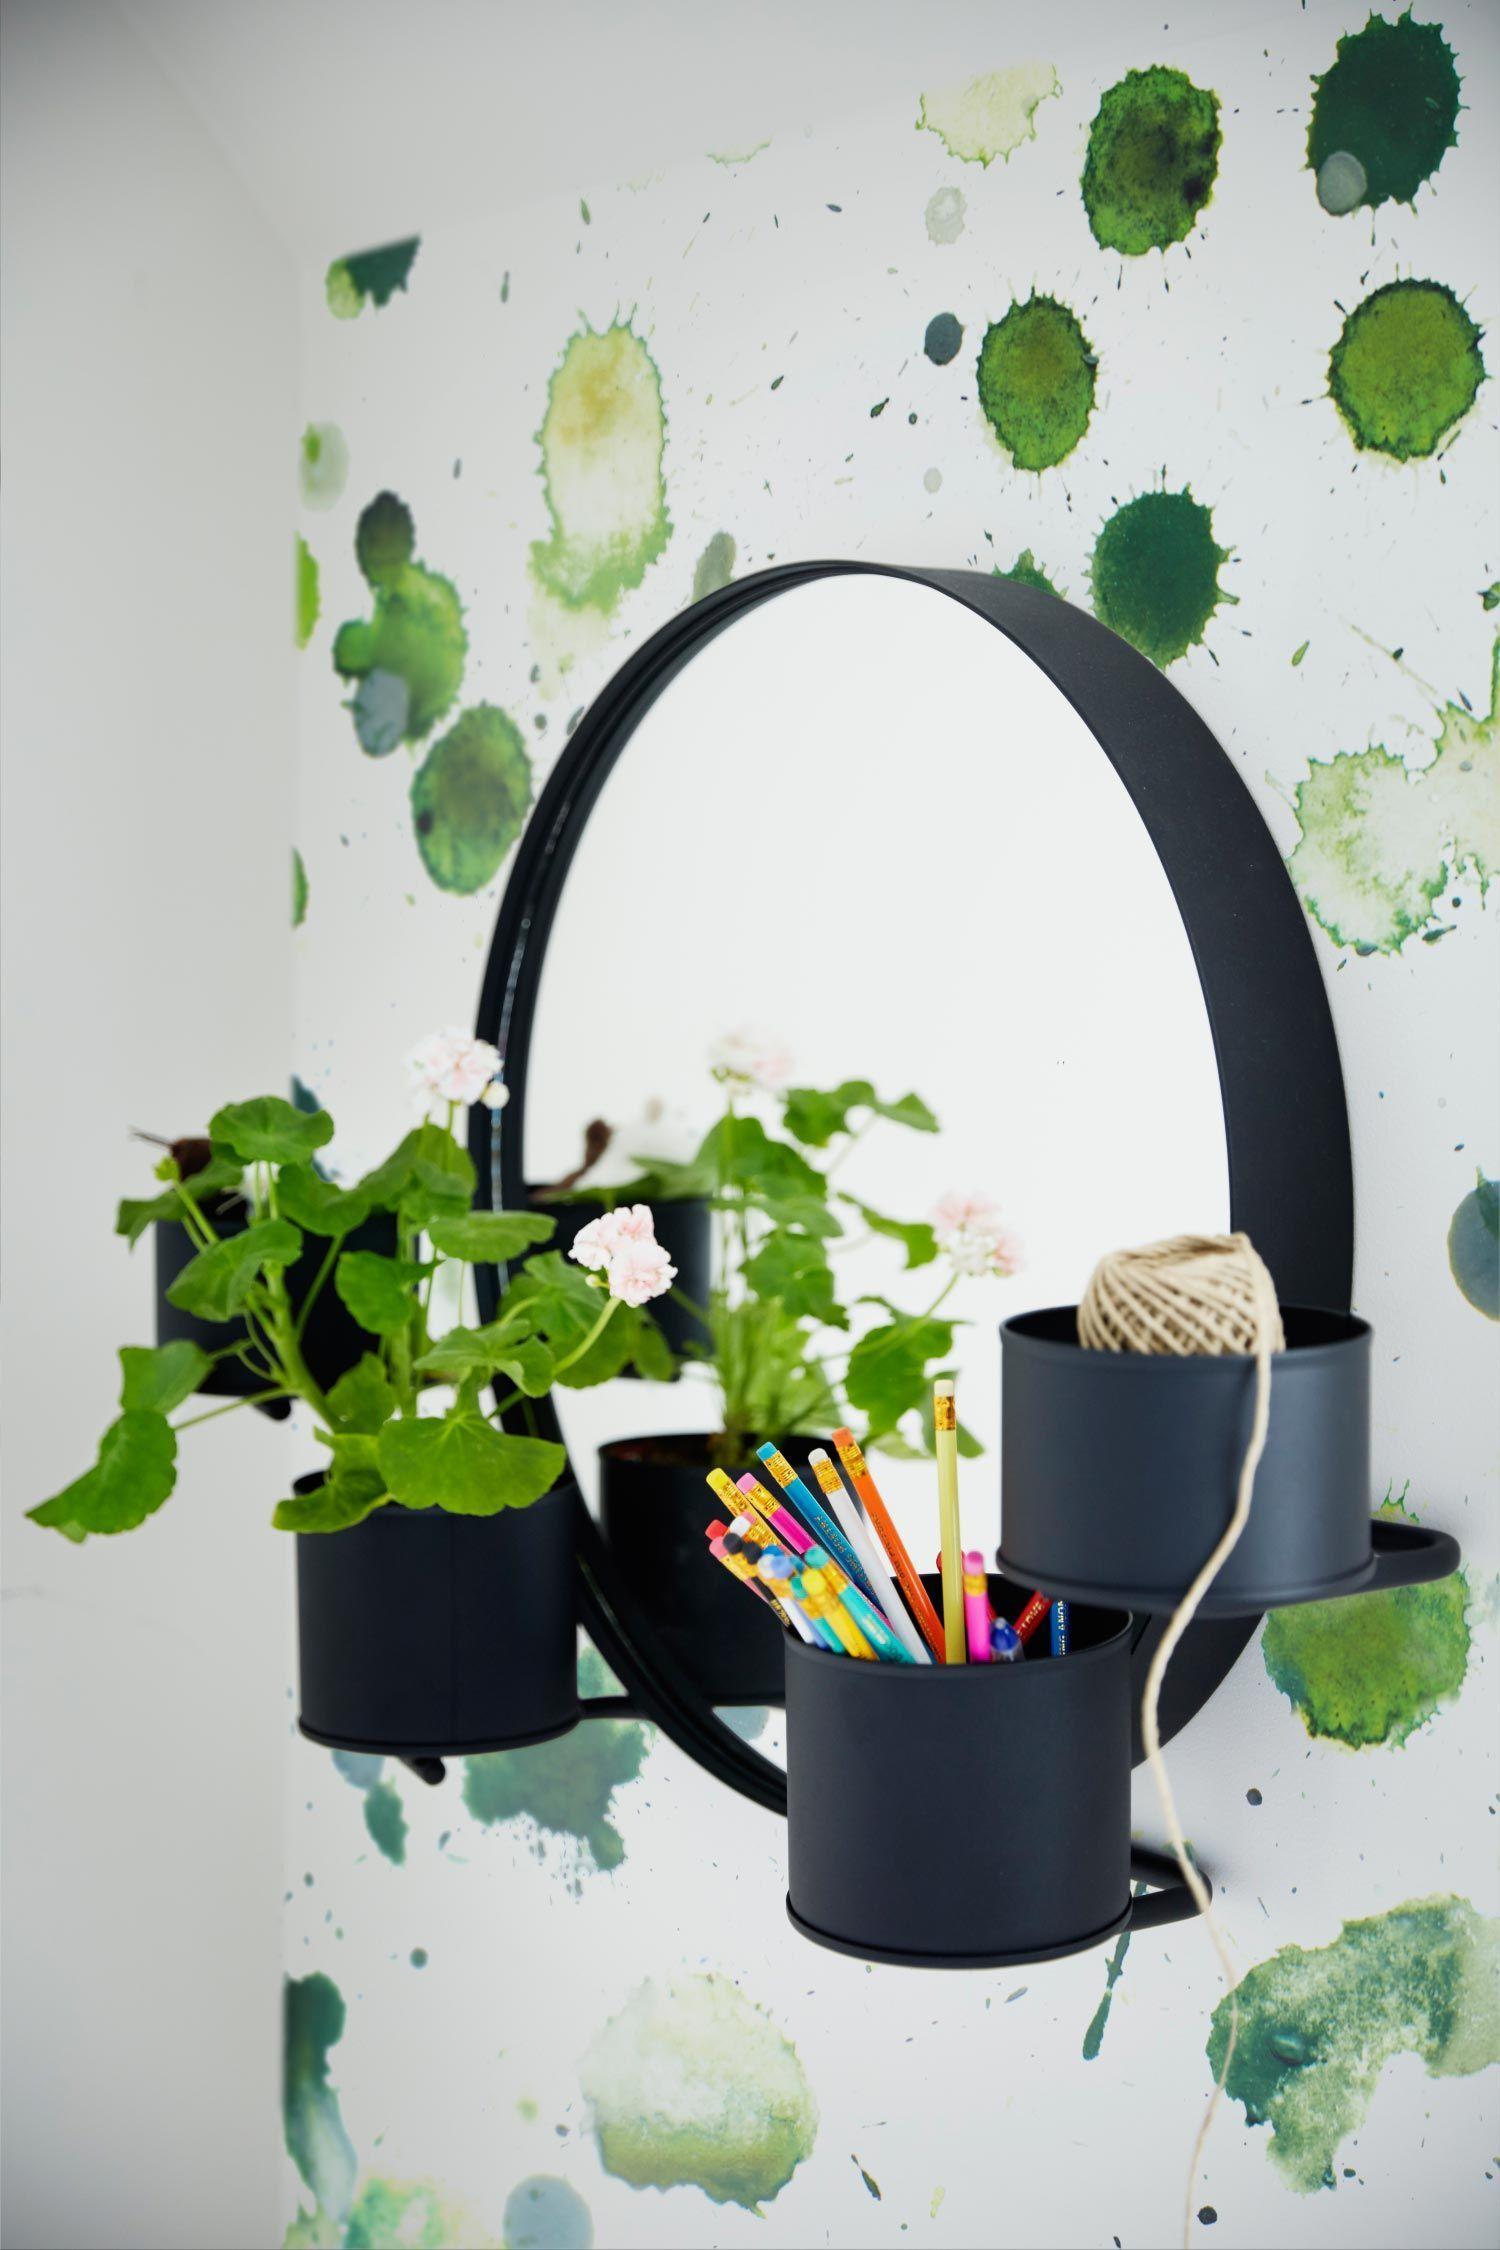 Ikea Sallskap Limited Edition Furniture Collection   www.bocadolobo.com   #exclusivedesign #limitededition #luxuryfurniture